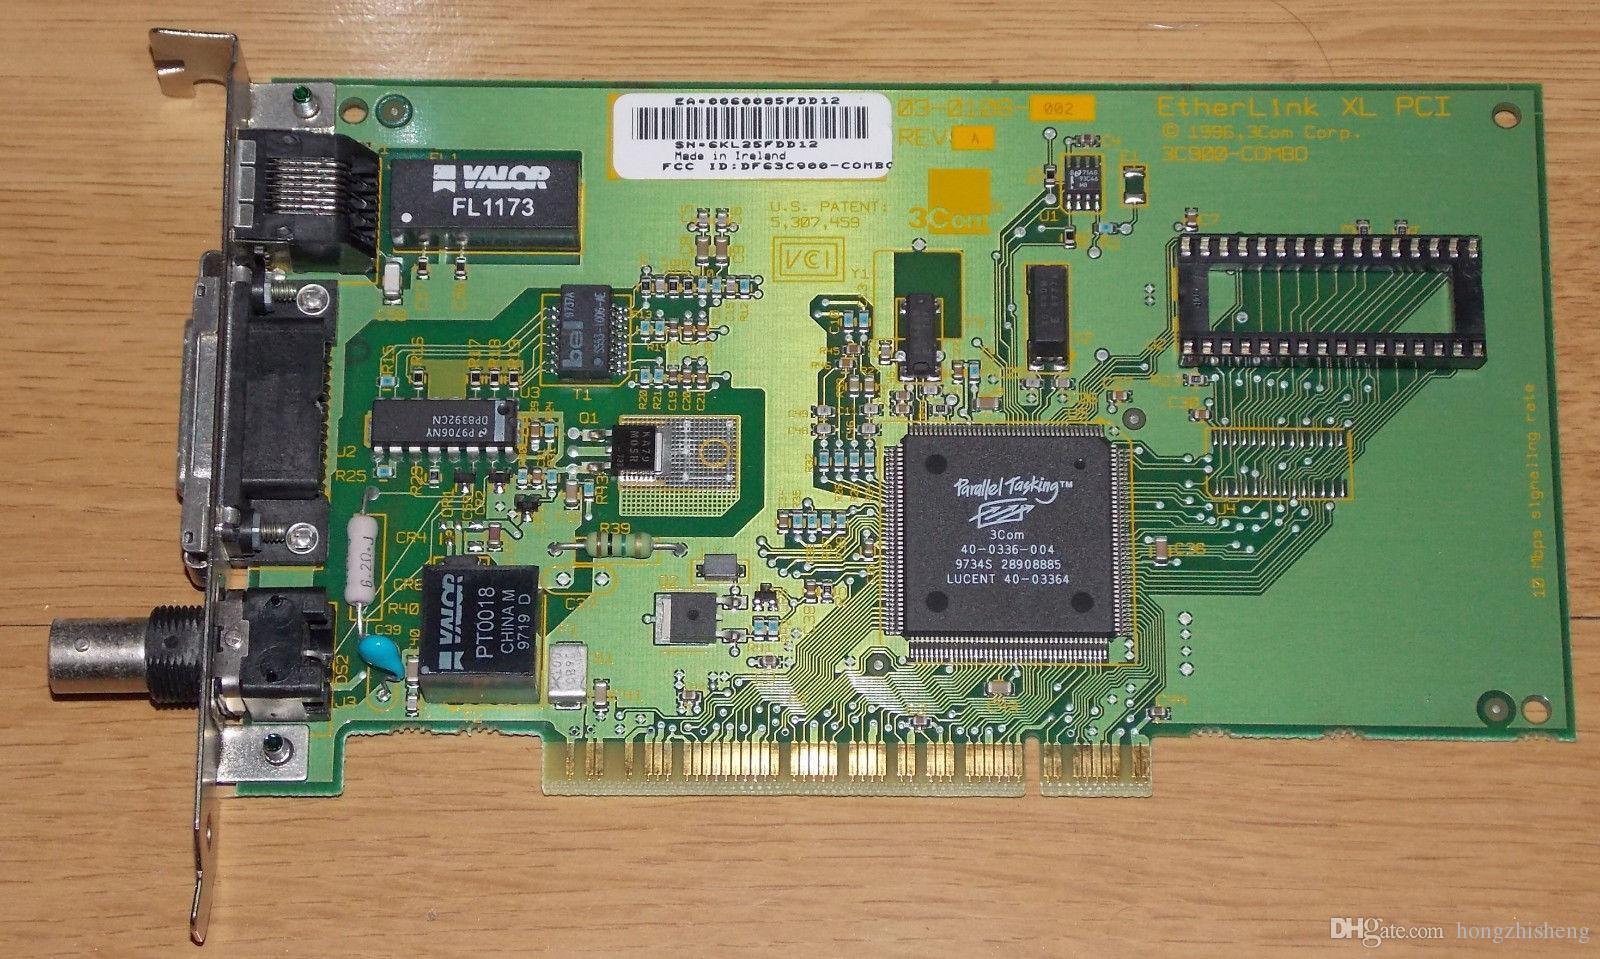 Endüstriyel ekipman kartı PCI arayüzü Ağ adaptörü BNC AUI 3C900-COMBO 03-0108-002 REV A